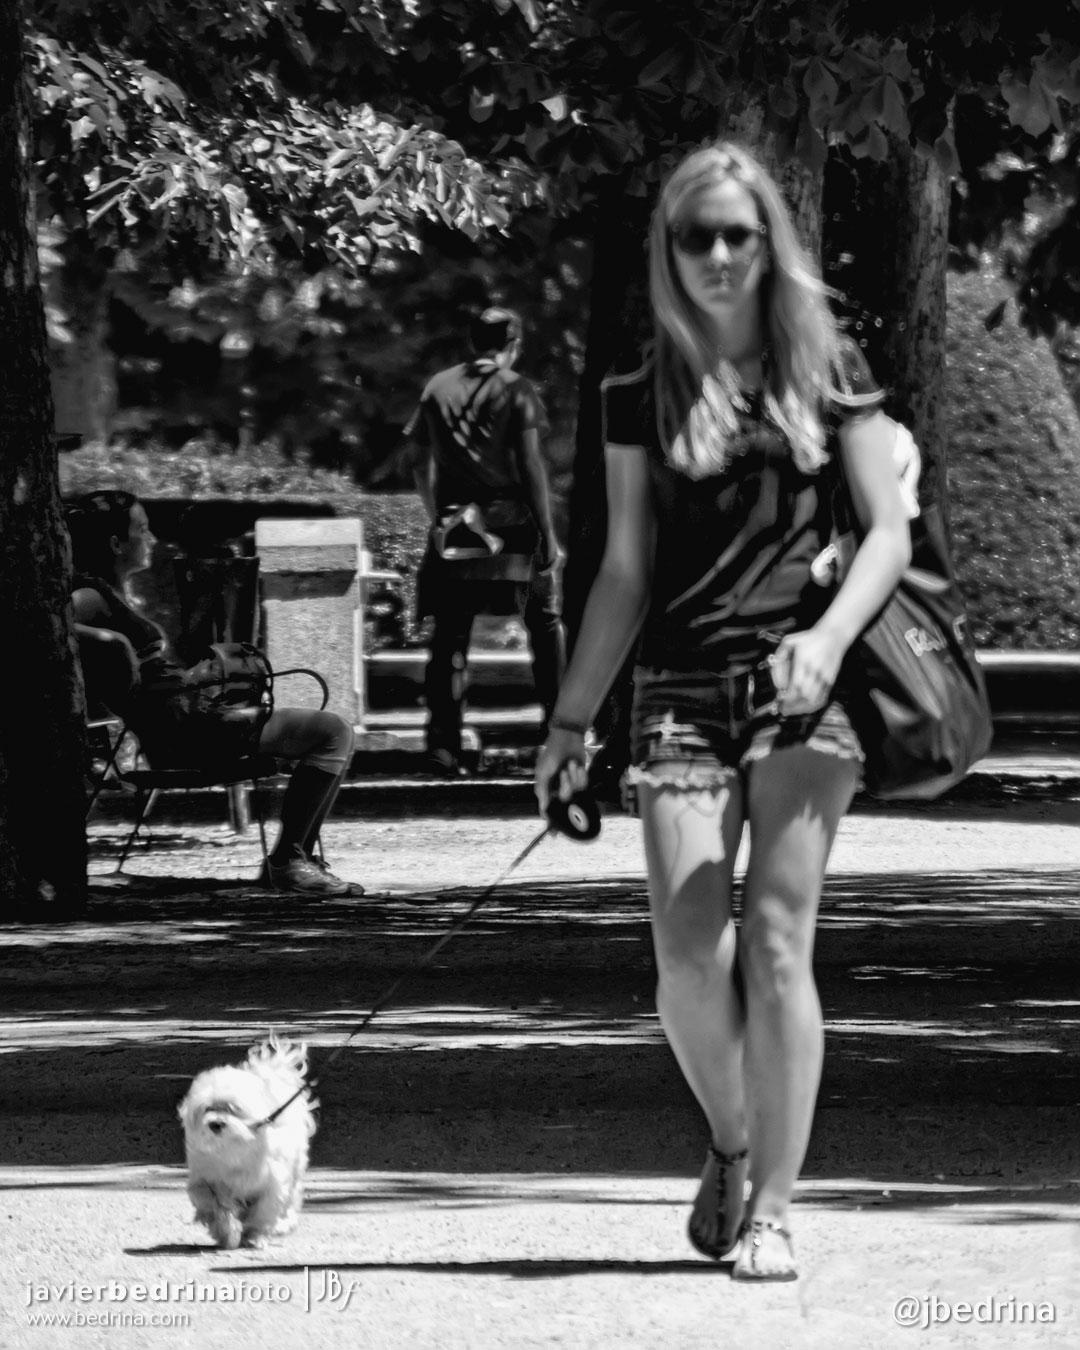 Streetphoto. Chica paseando al perrito en el Retiro